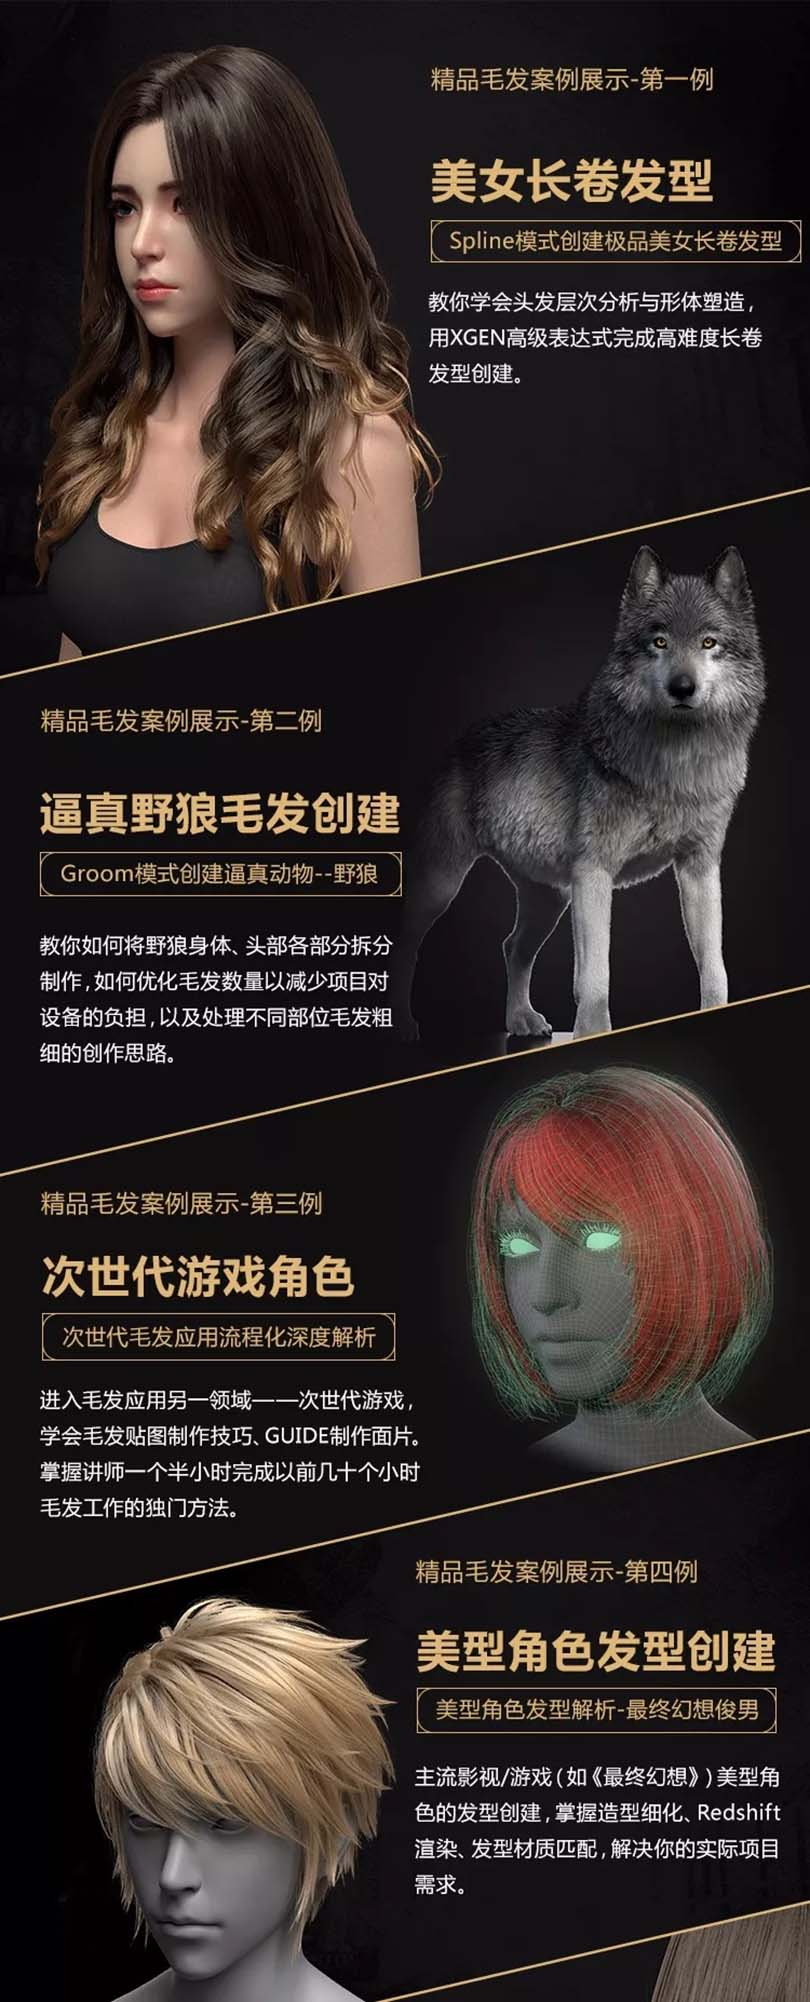 XGEN毛发制作教程介绍